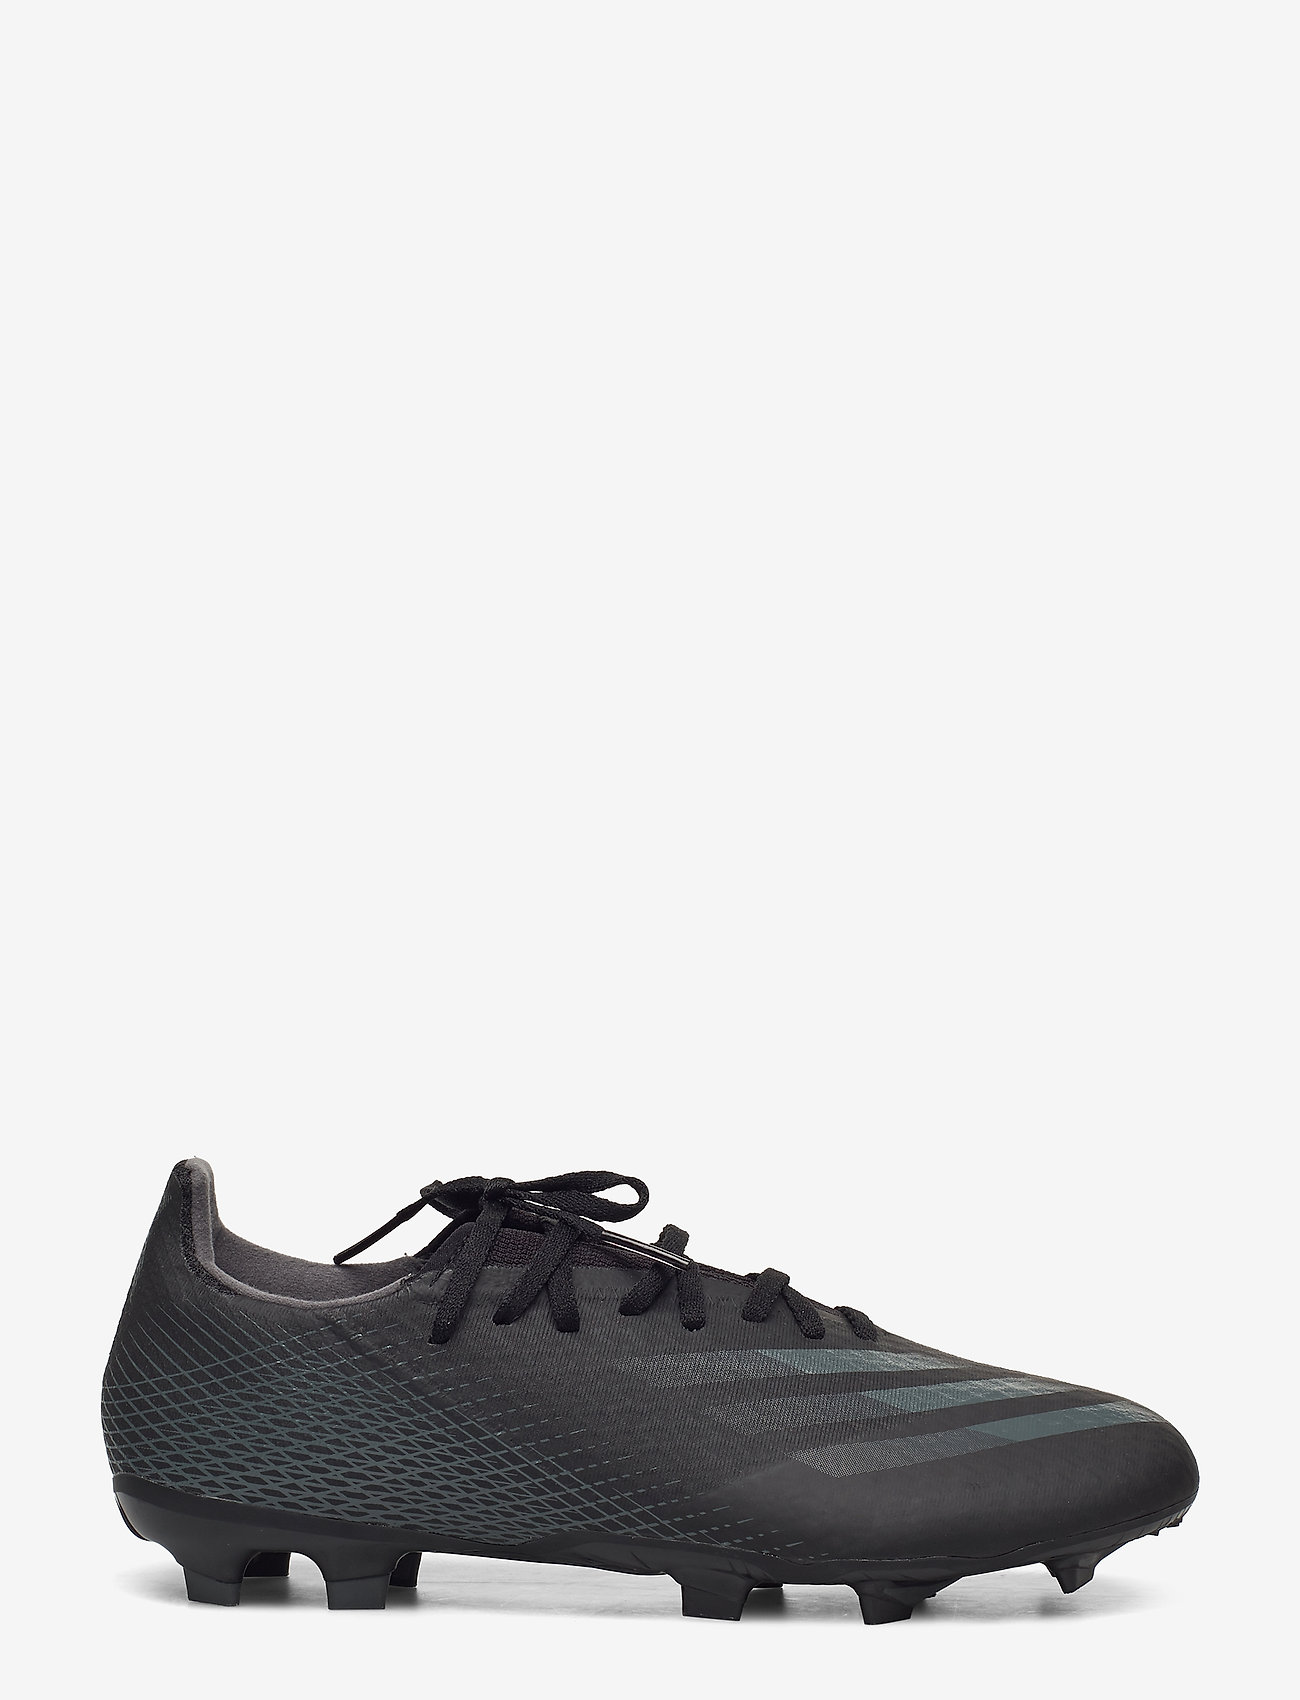 adidas Performance - X GHOSTED.3 FG - fotbollsskor - cblack/cblack/gresix - 1